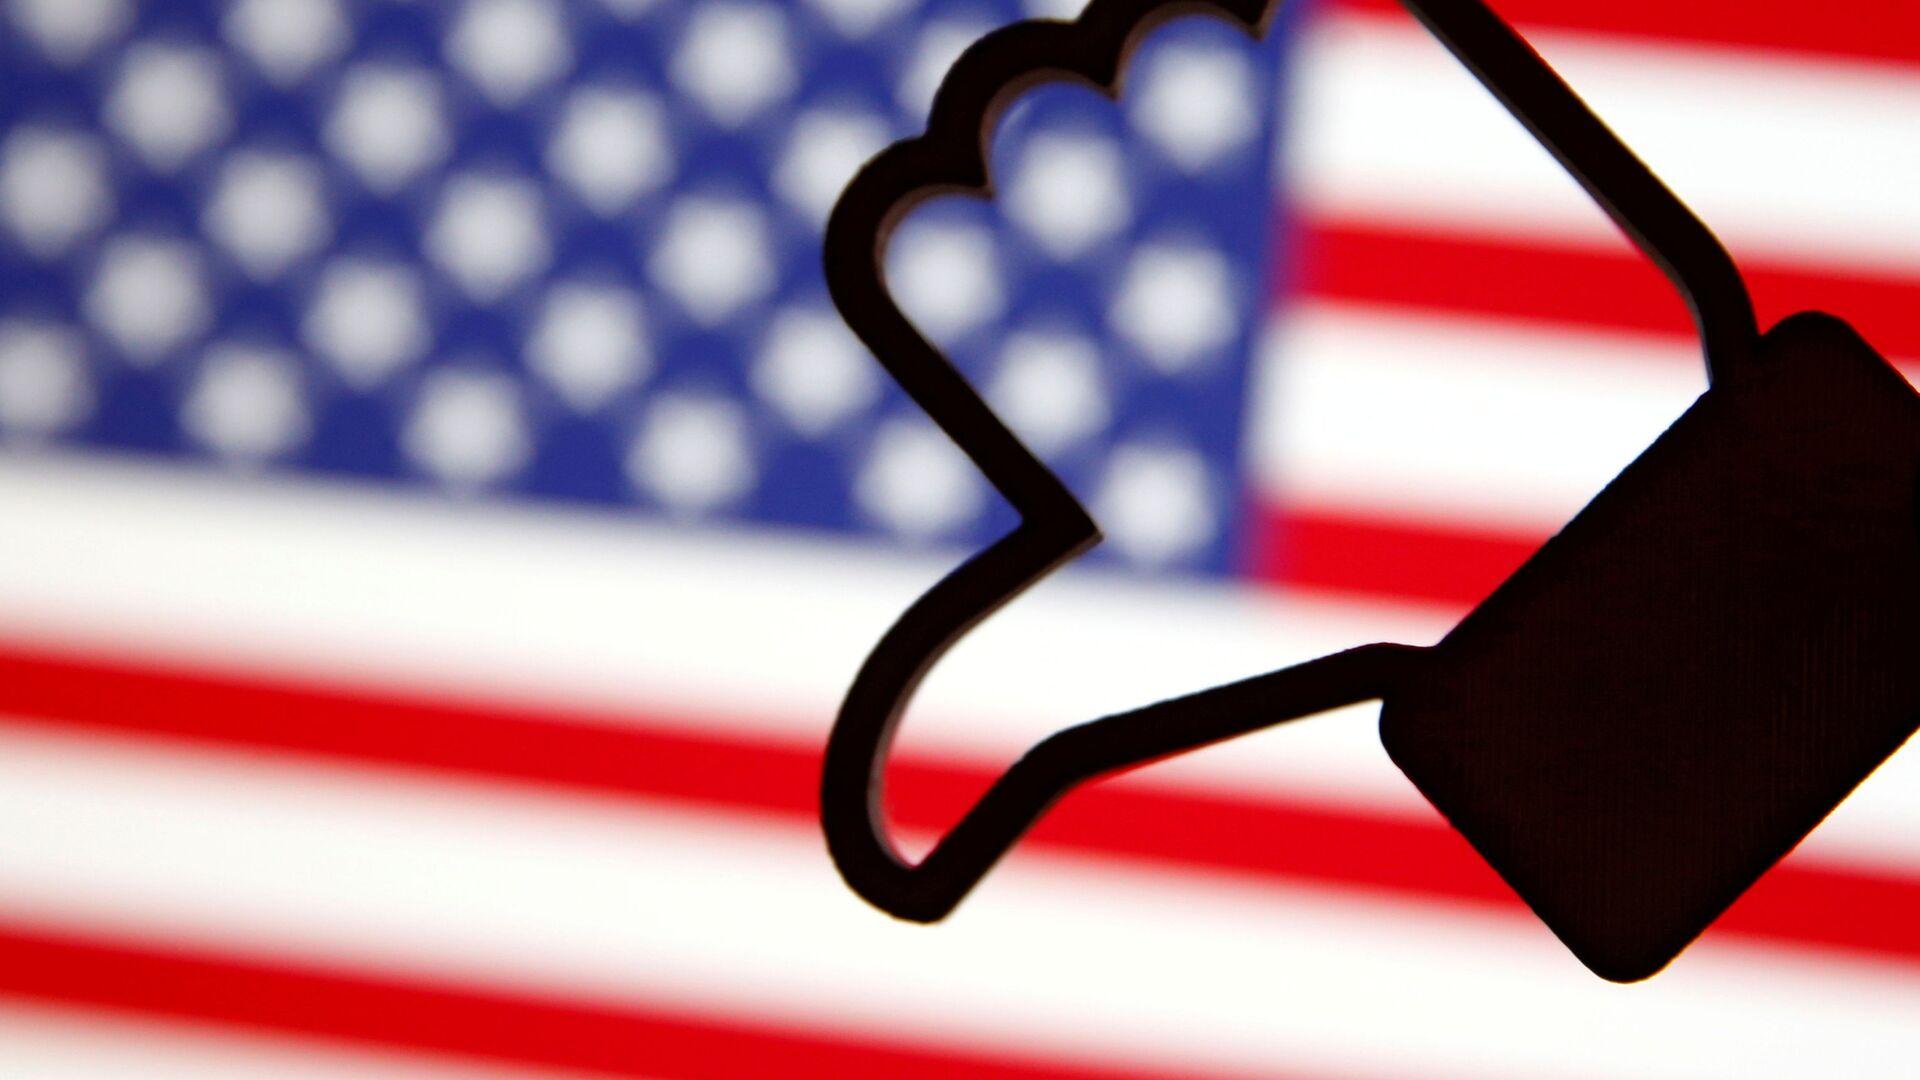 3 Д симбол Фејсбуковог лајка, обрнуто, испред америчке заставе. - Sputnik Србија, 1920, 05.10.2021